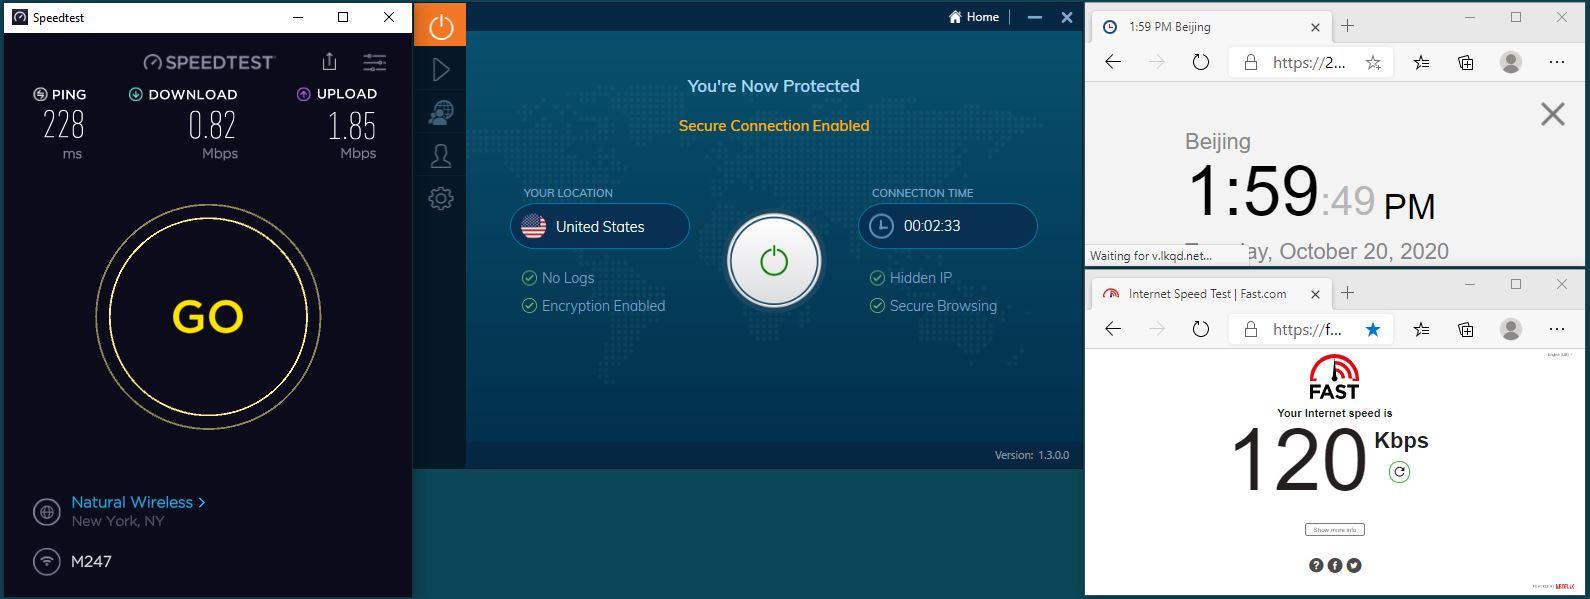 Windows10 IvacyVPN UDP+5555端口 USA 服务器 中国VPN 翻墙 科学上网 翻墙速度测试 - 20201020